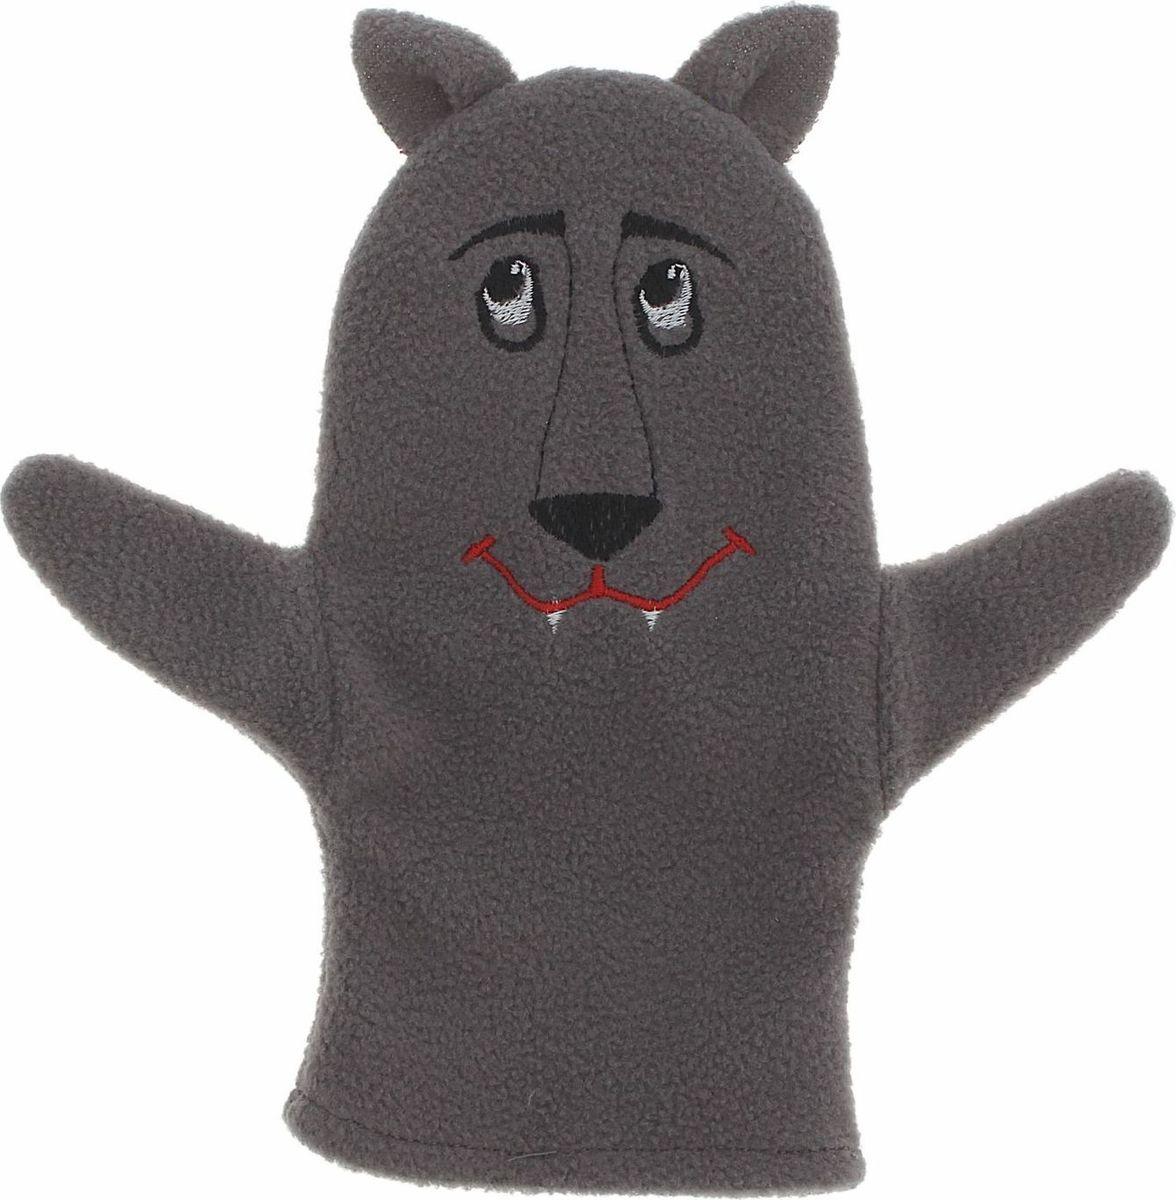 Sima-land Игрушка на руку Волк sima land кукла на руку волк